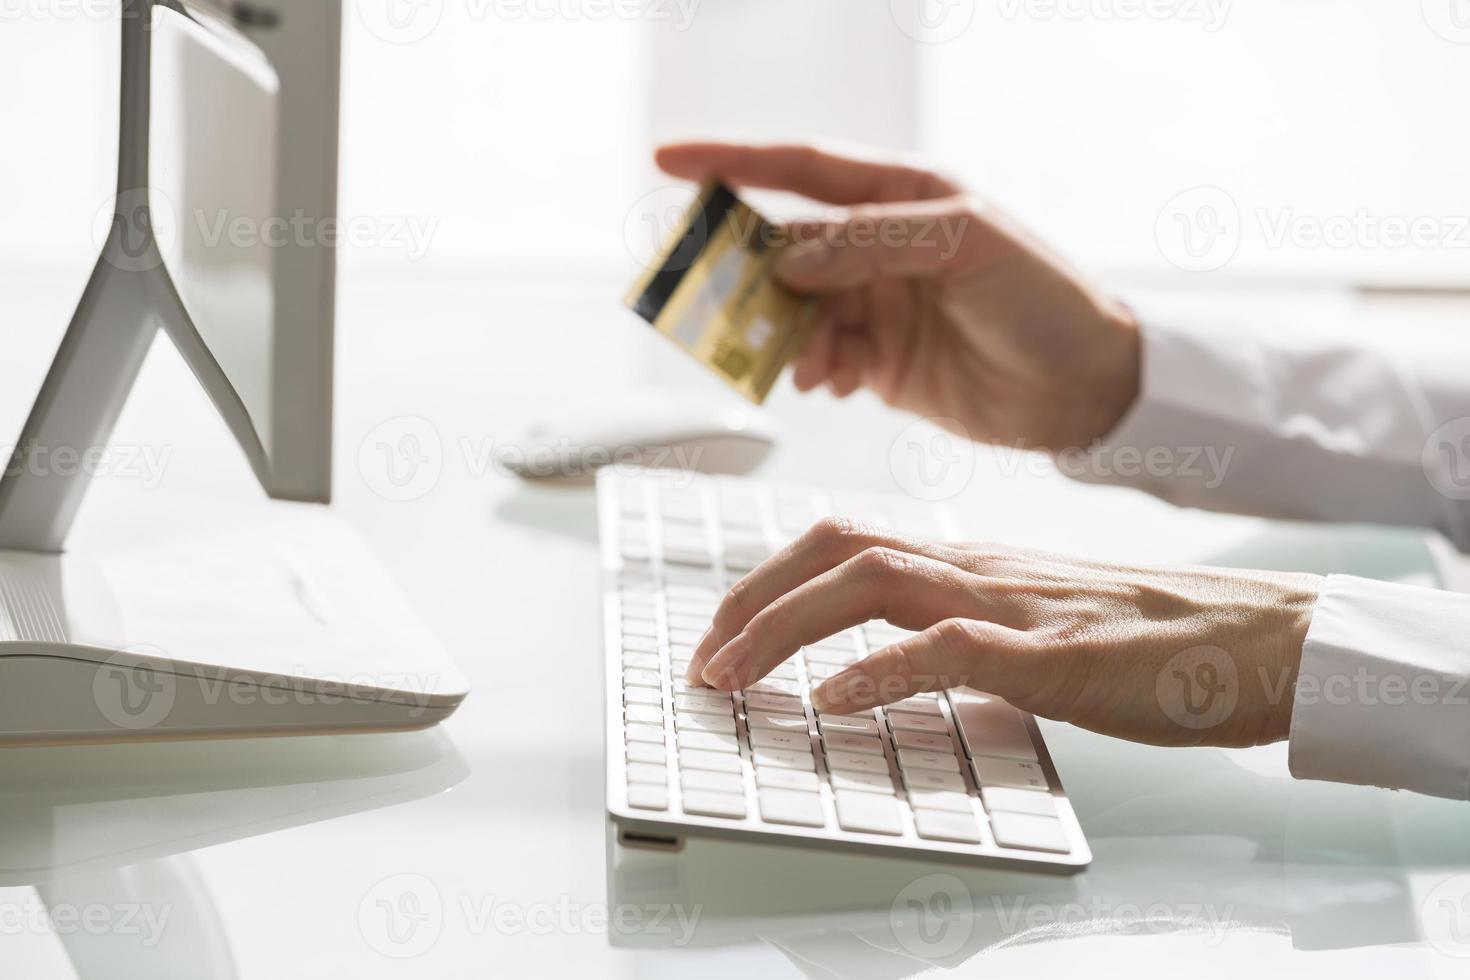 femme, achats, utilisation, informatique, crédit, card.indoor.close-up photo